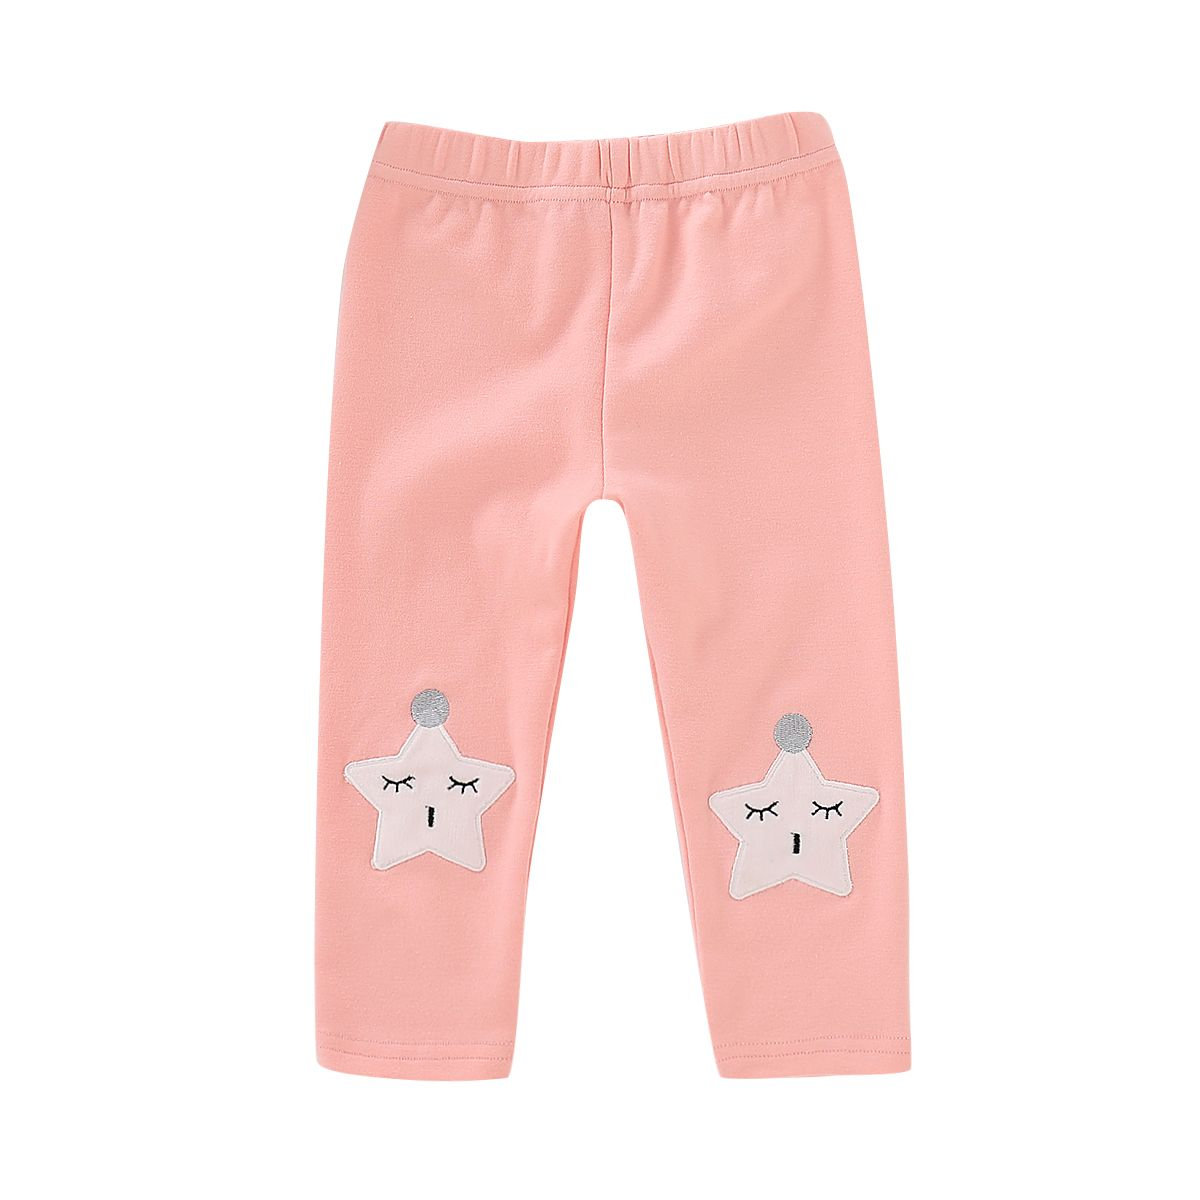 8cb43caf85fd4 Toddler Big Girl Star Pink Leggings Children Footless Tights ...